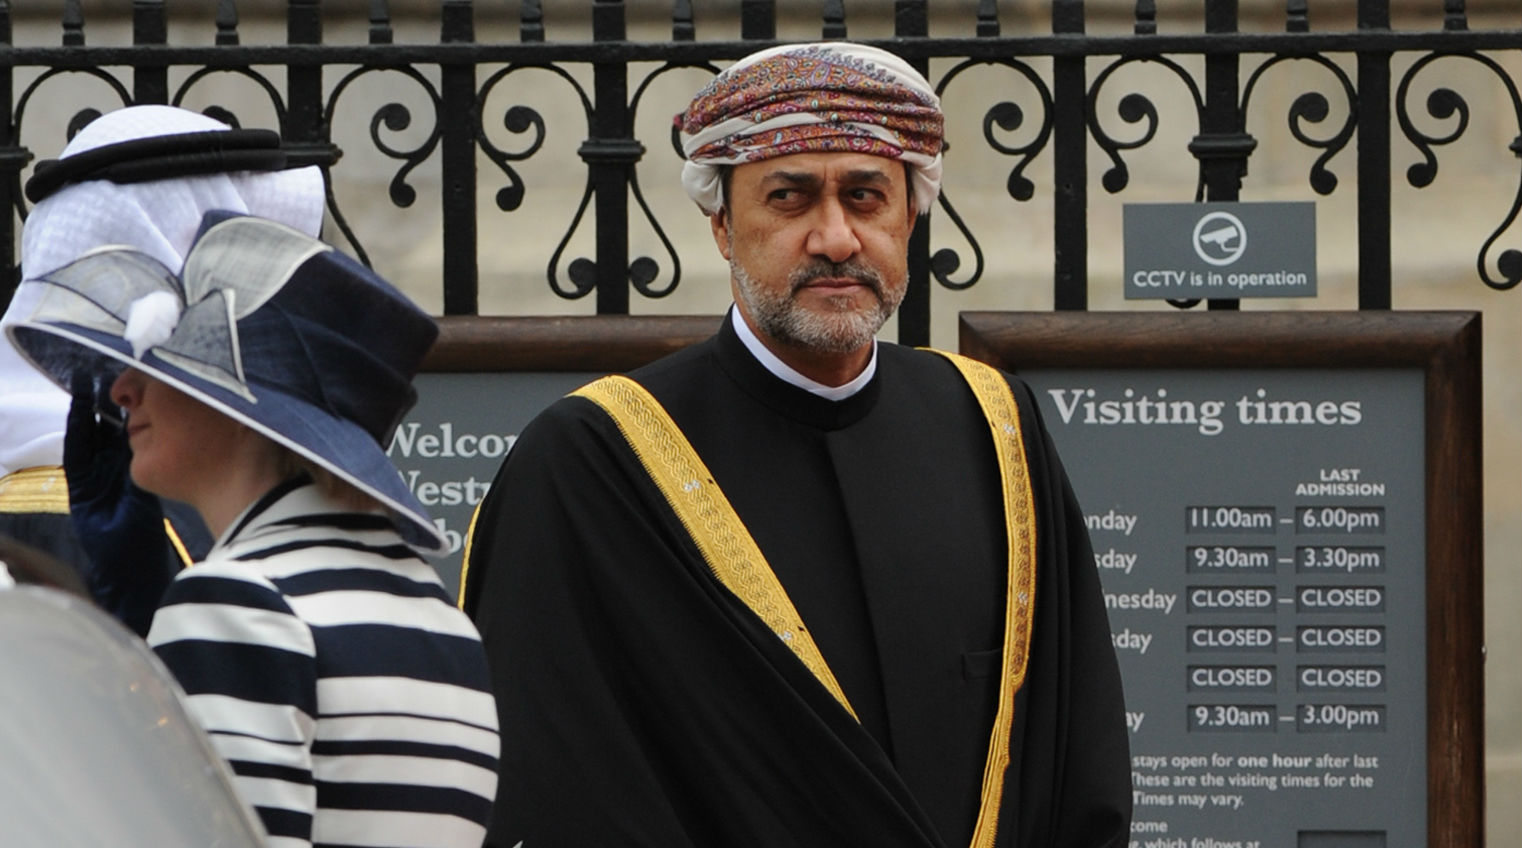 Haitham bin Tariq Cousin of Late Oman Sultan Qaboos bin Said al Said Sworn in as New Ruler